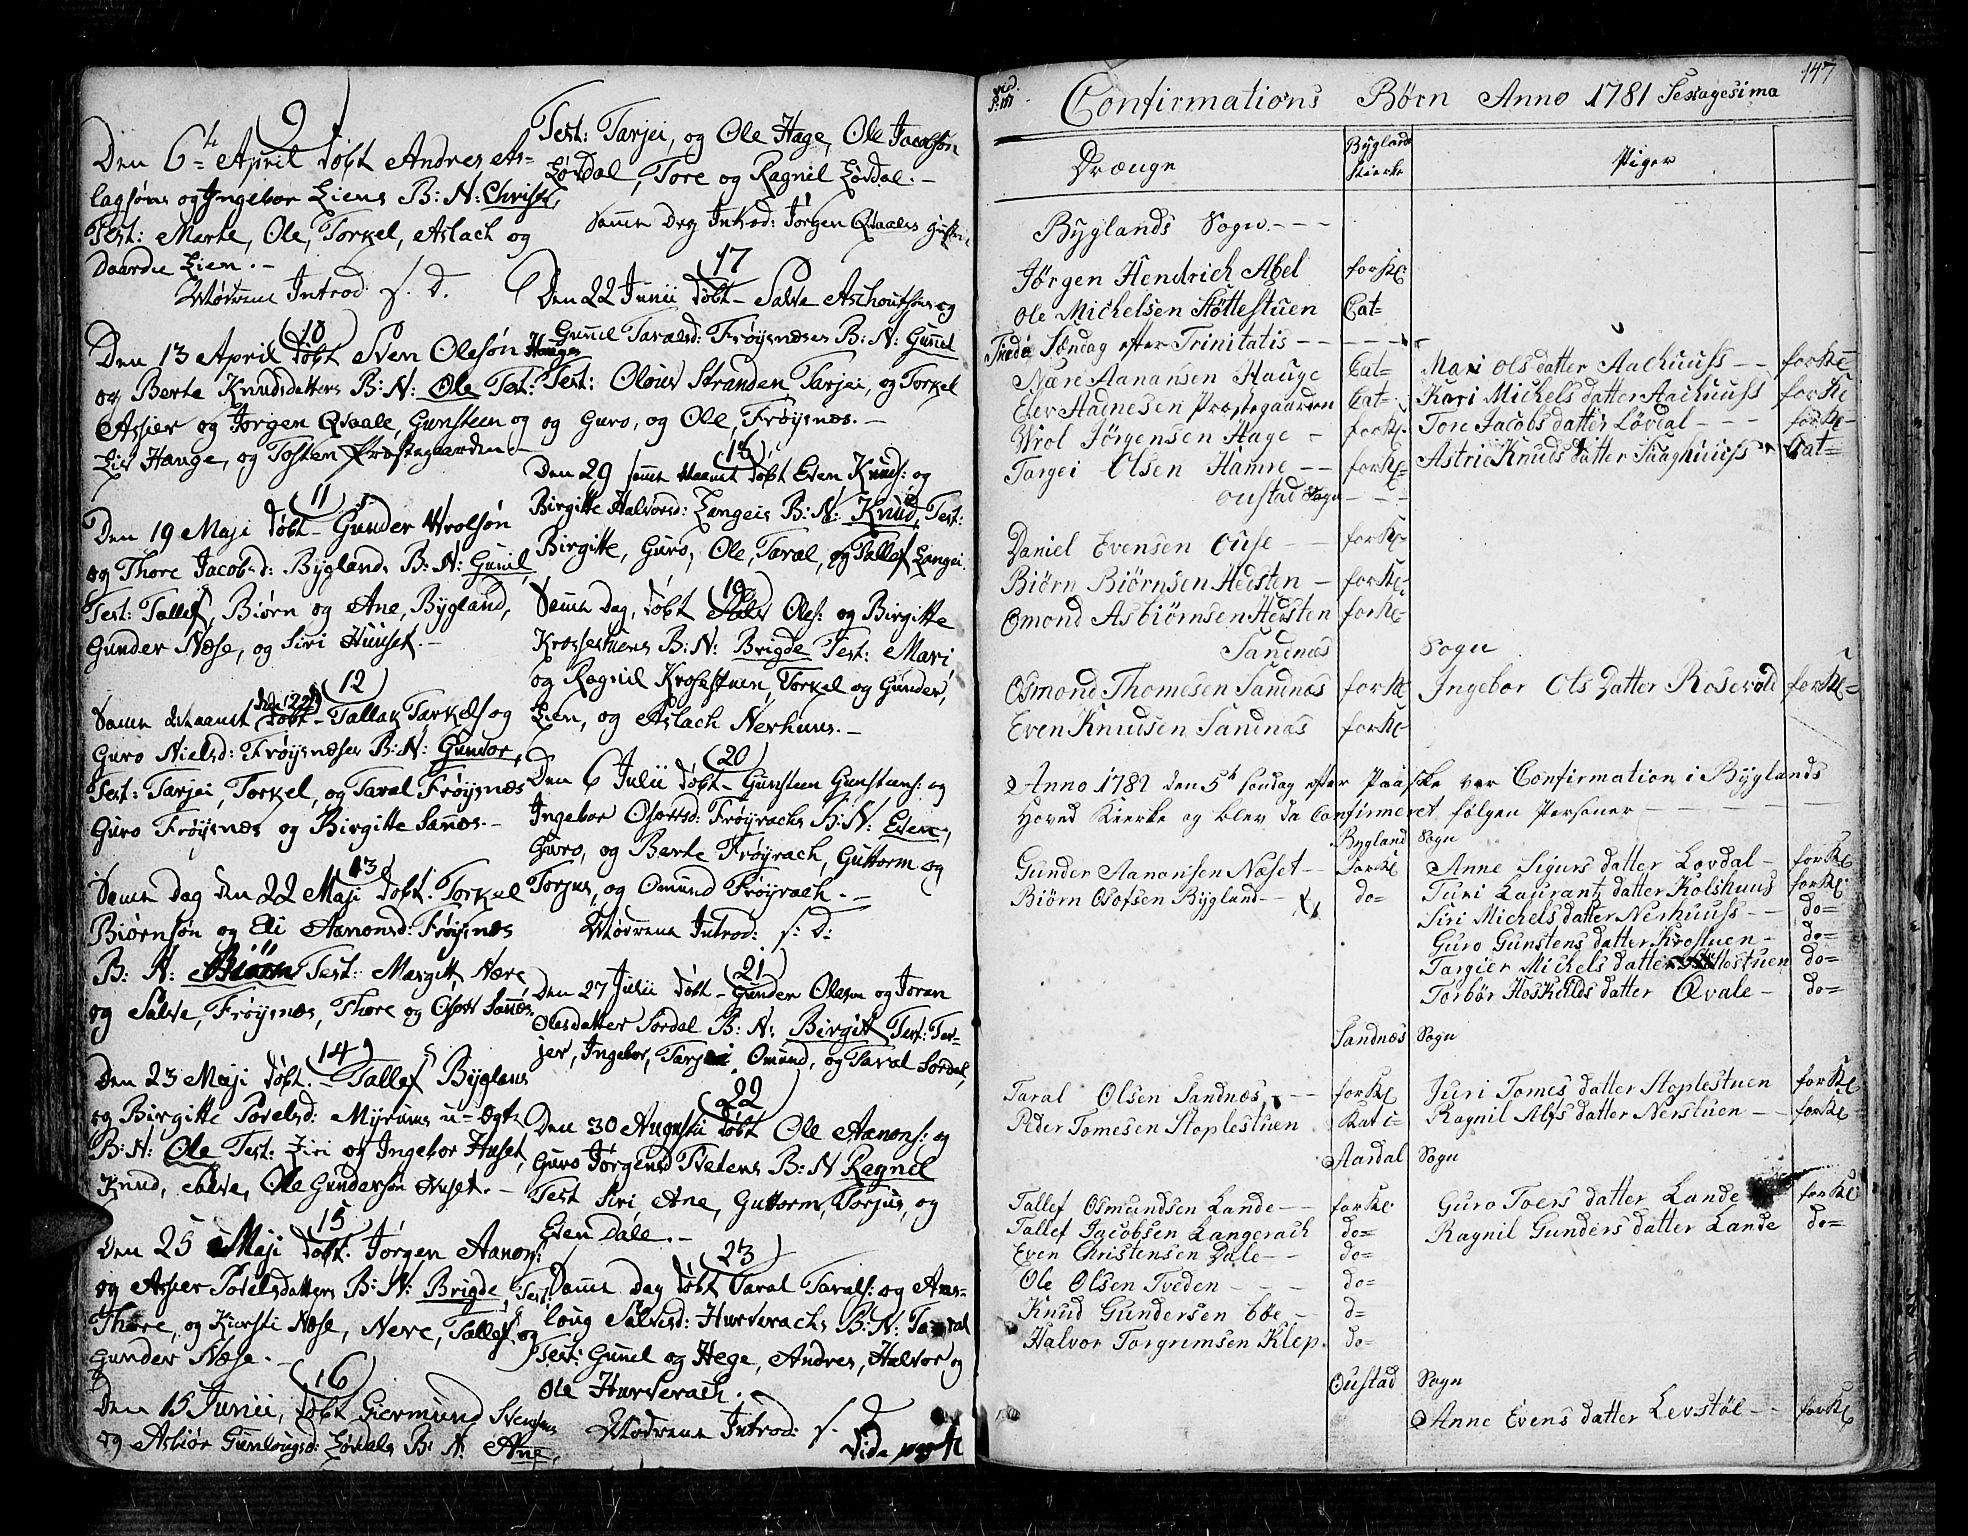 SAK, Bygland sokneprestkontor, F/Fa/Fab/L0002: Ministerialbok nr. A 2, 1766-1816, s. 141